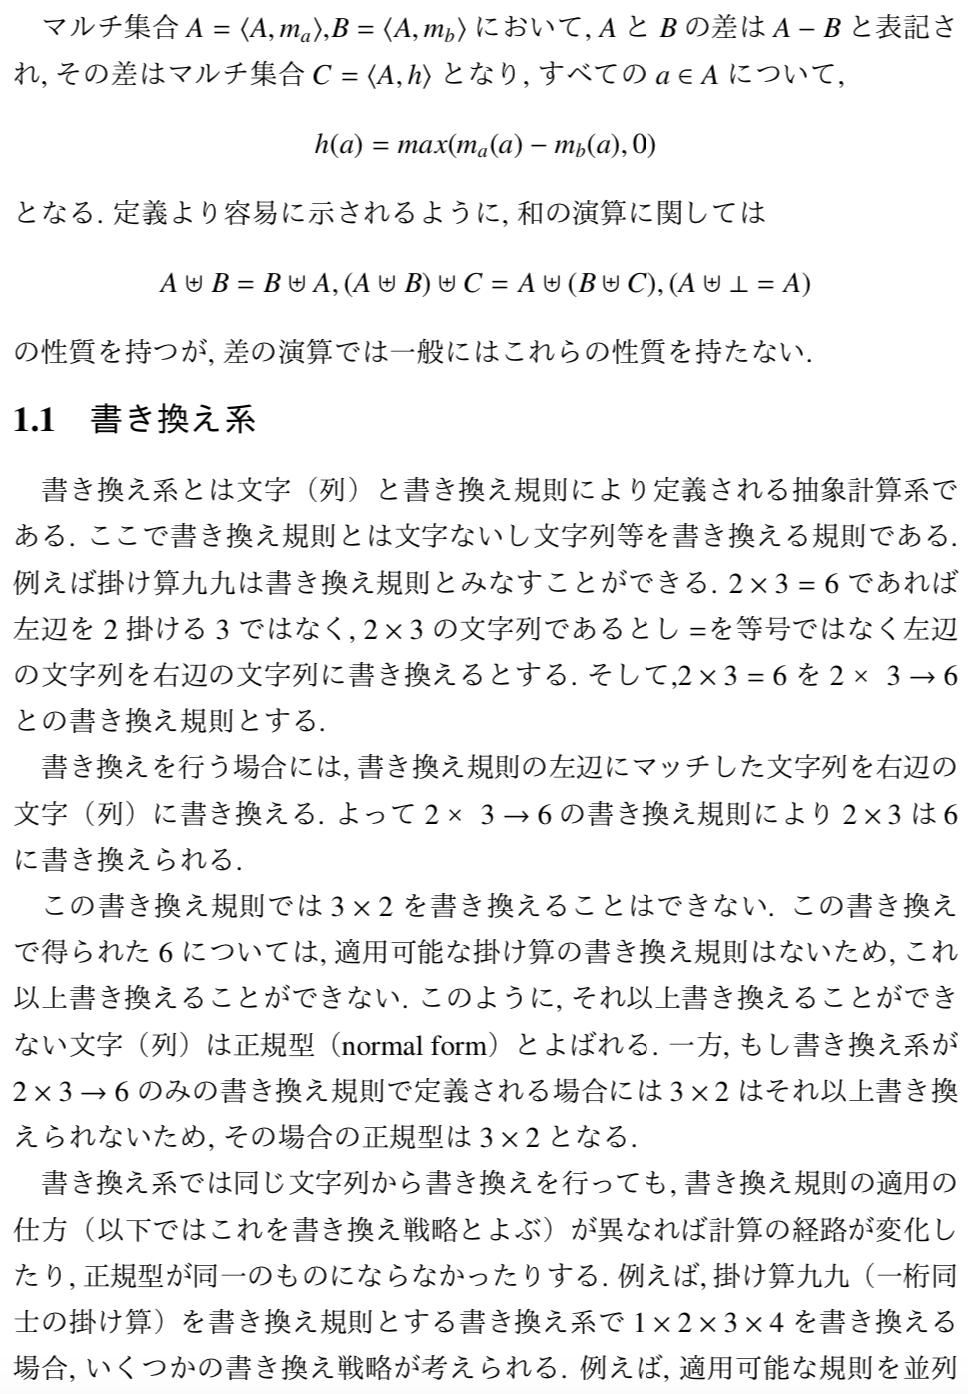 nc9-3